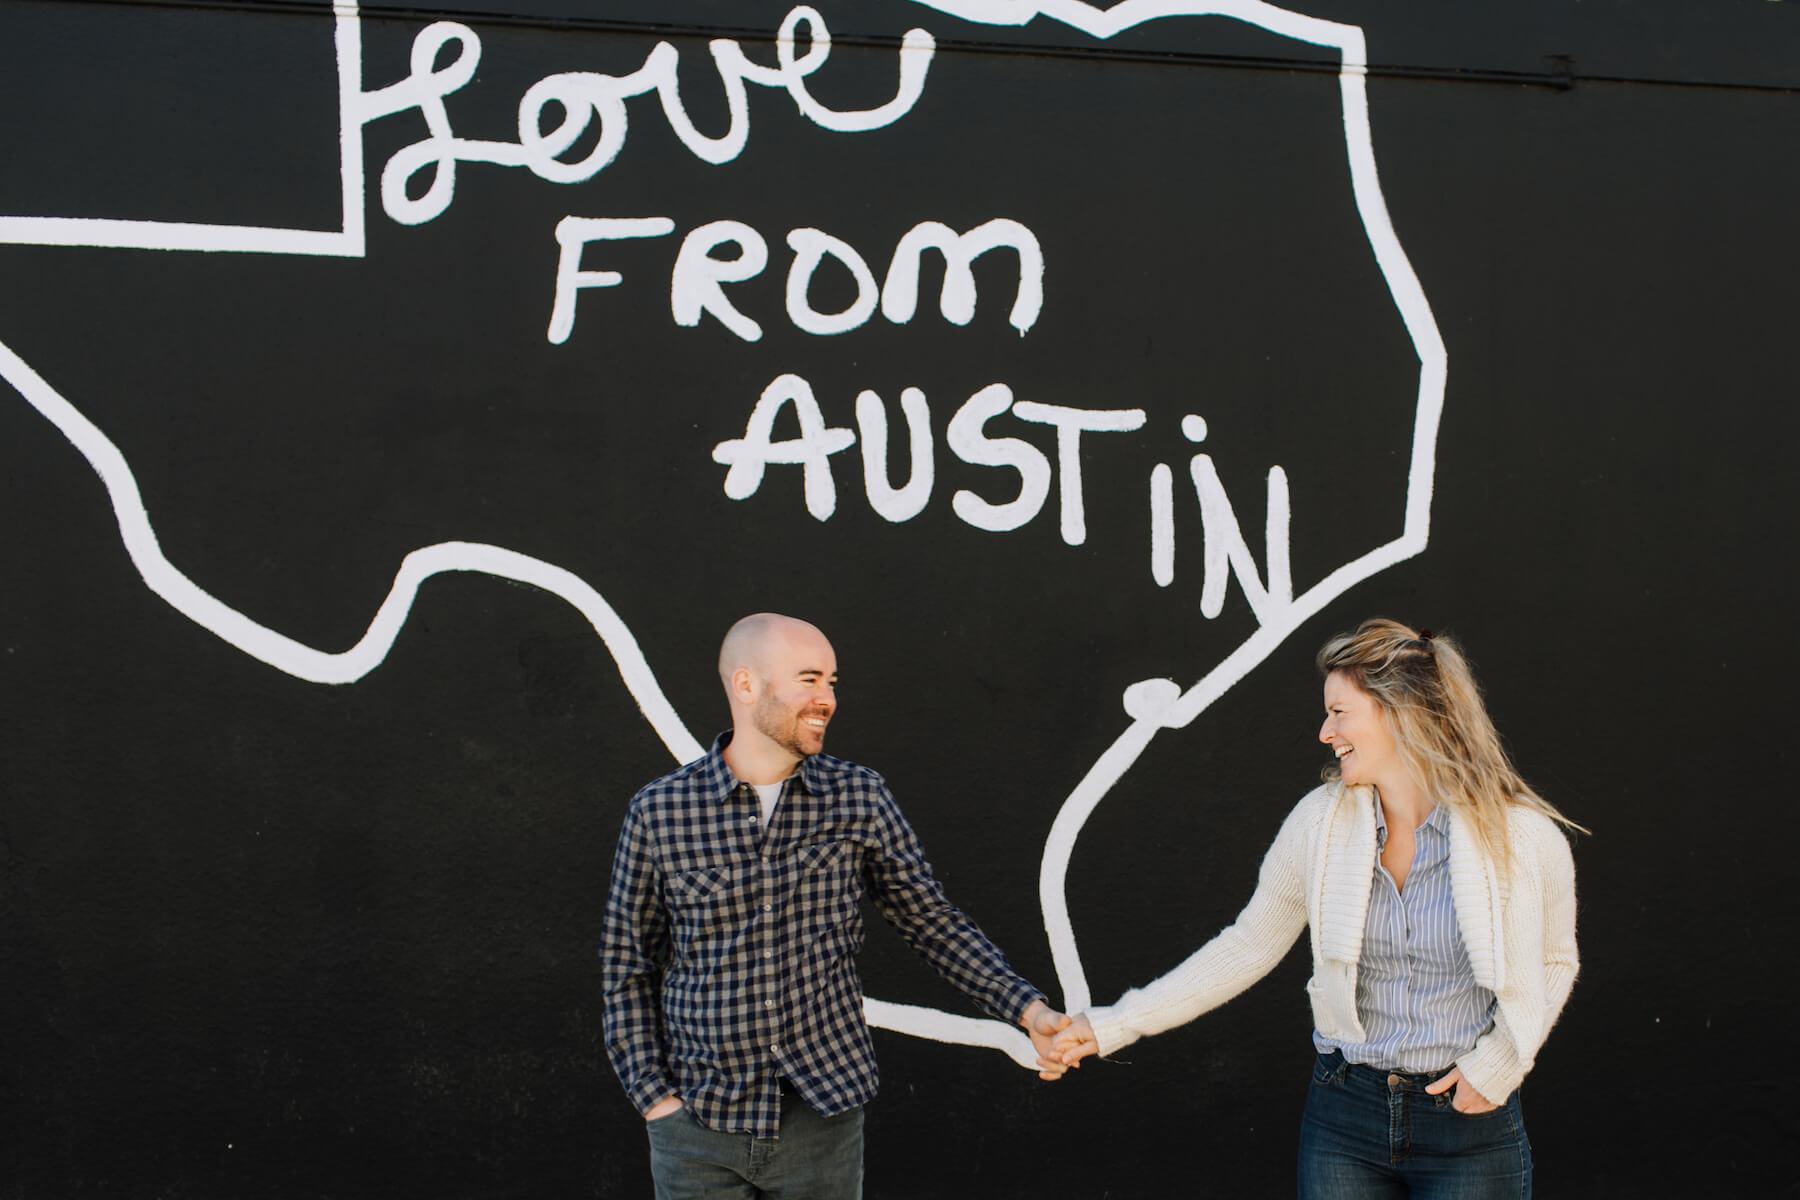 couples trip near South Congress Hotel Austin, Texas